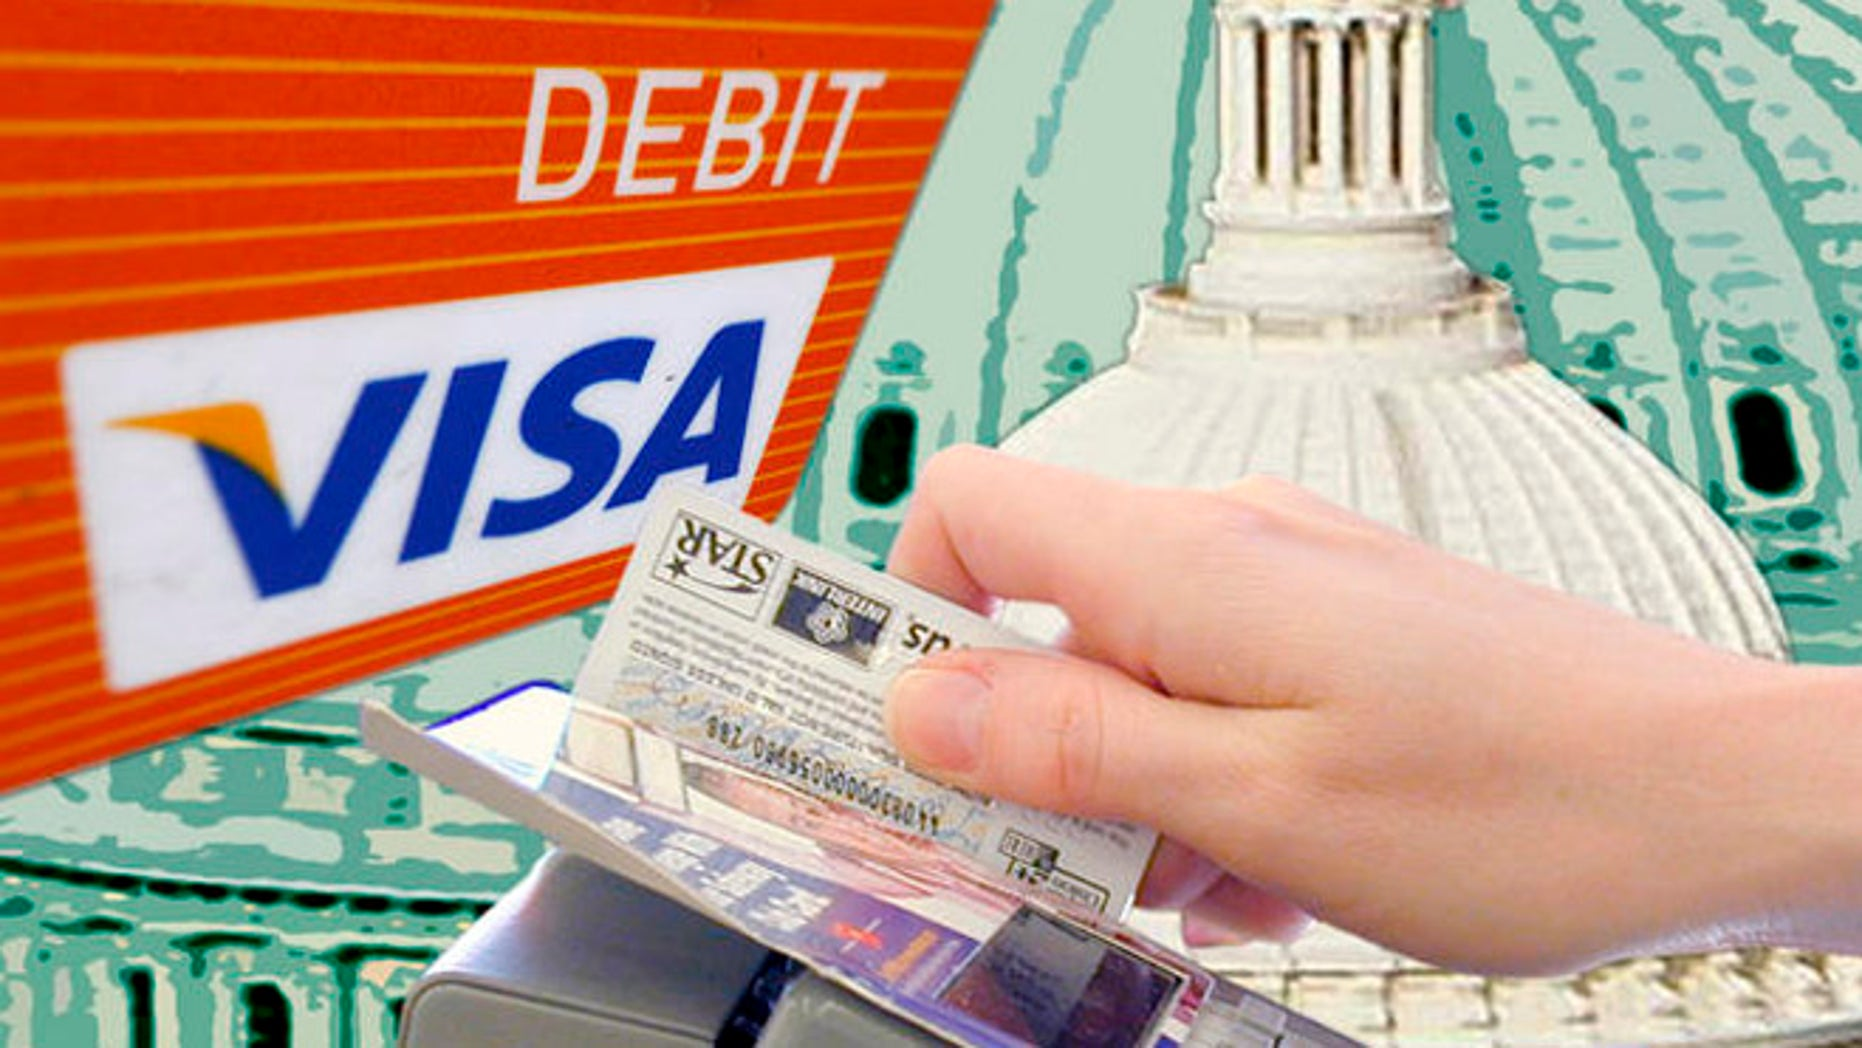 This photo taken Monday, Aug. 16, 2010, shows the Visa logo on the front of a Debit Card in Philadelphia. (AP Photo/Matt Rourke)